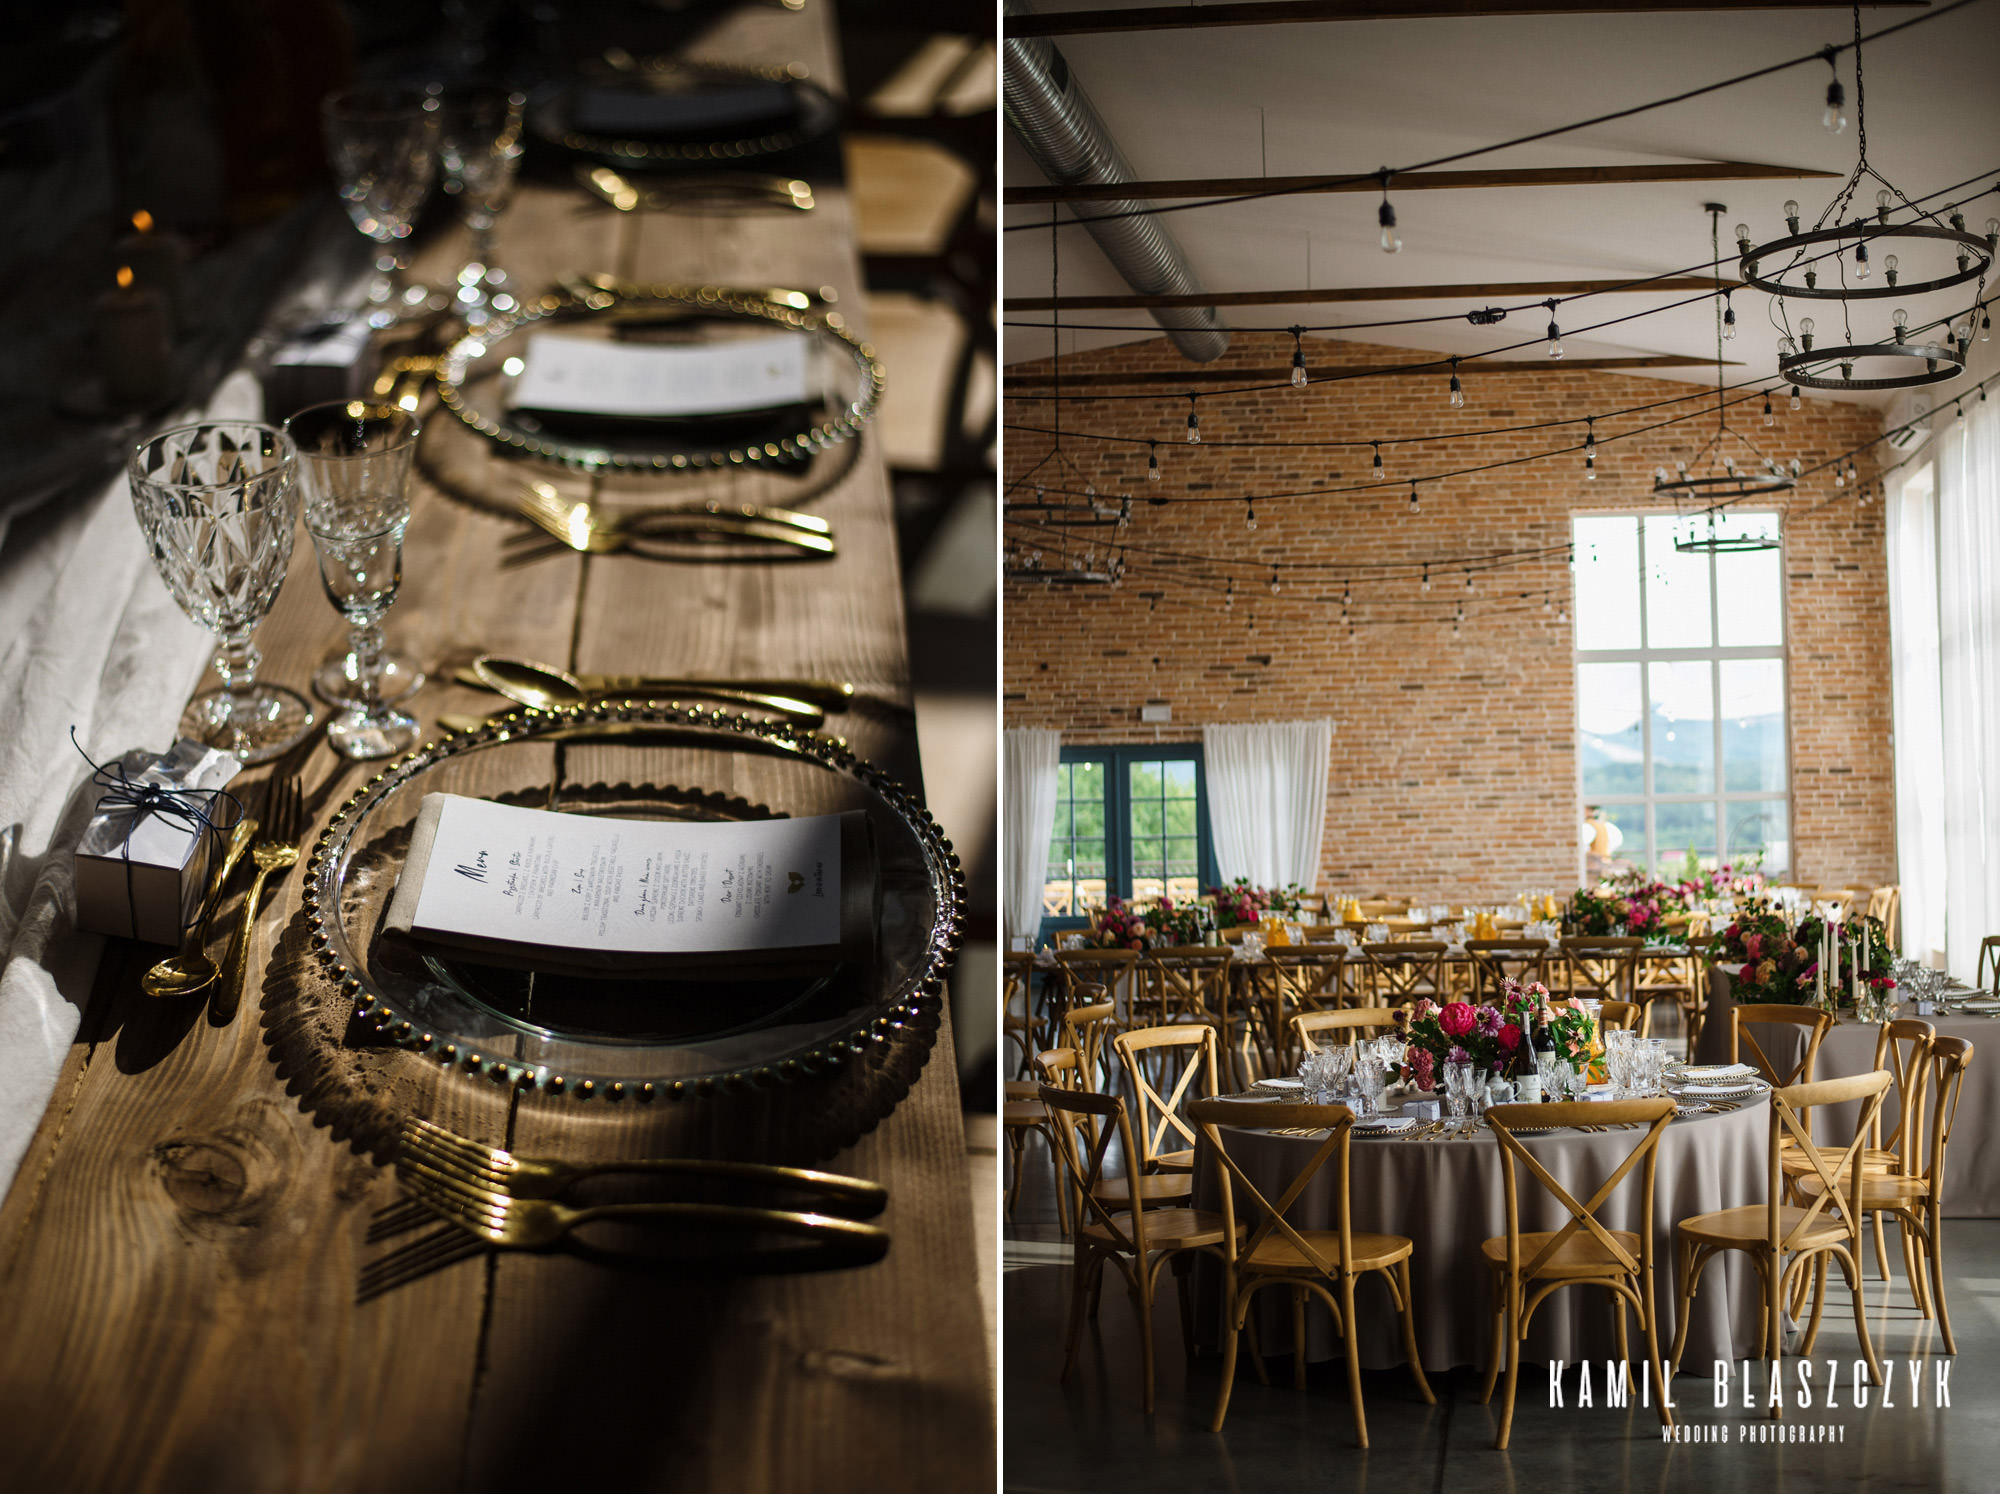 Villa Love dekoracje i okrągłe stoły